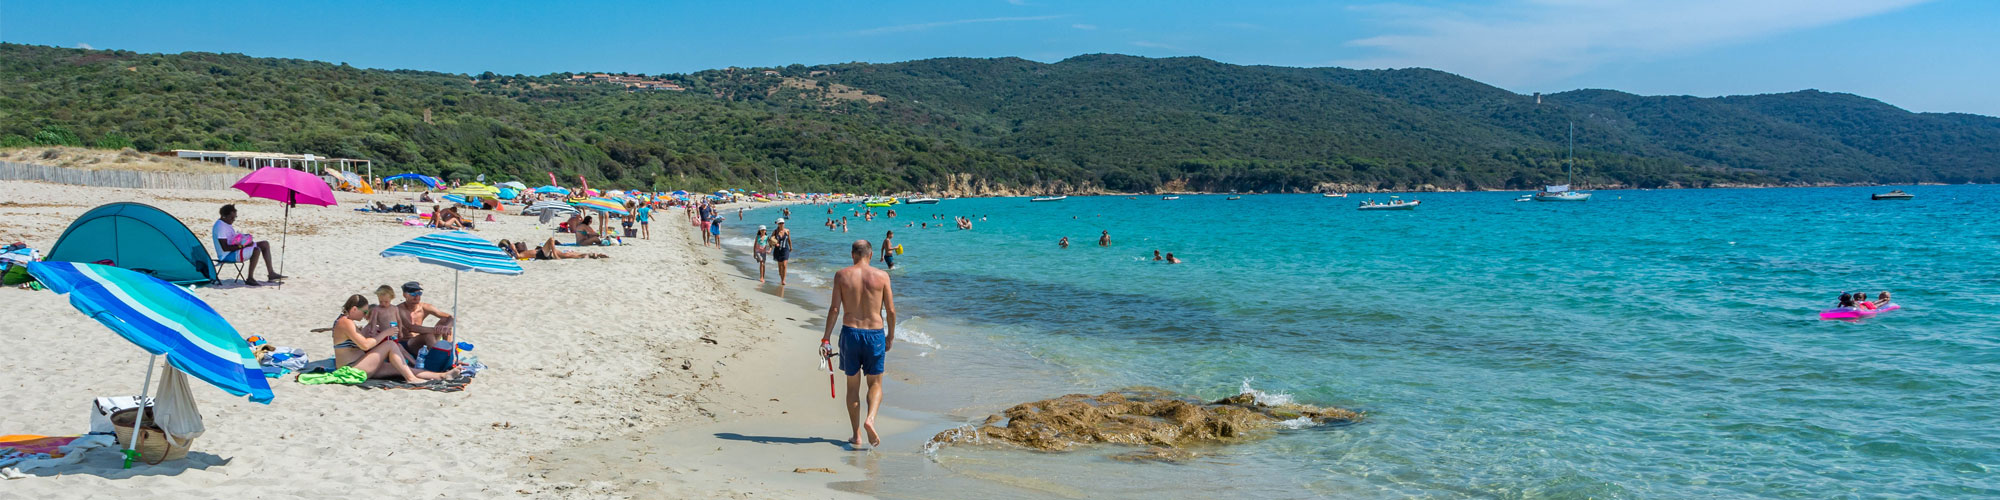 Paradisu - Korsika - Corse - Cupabia